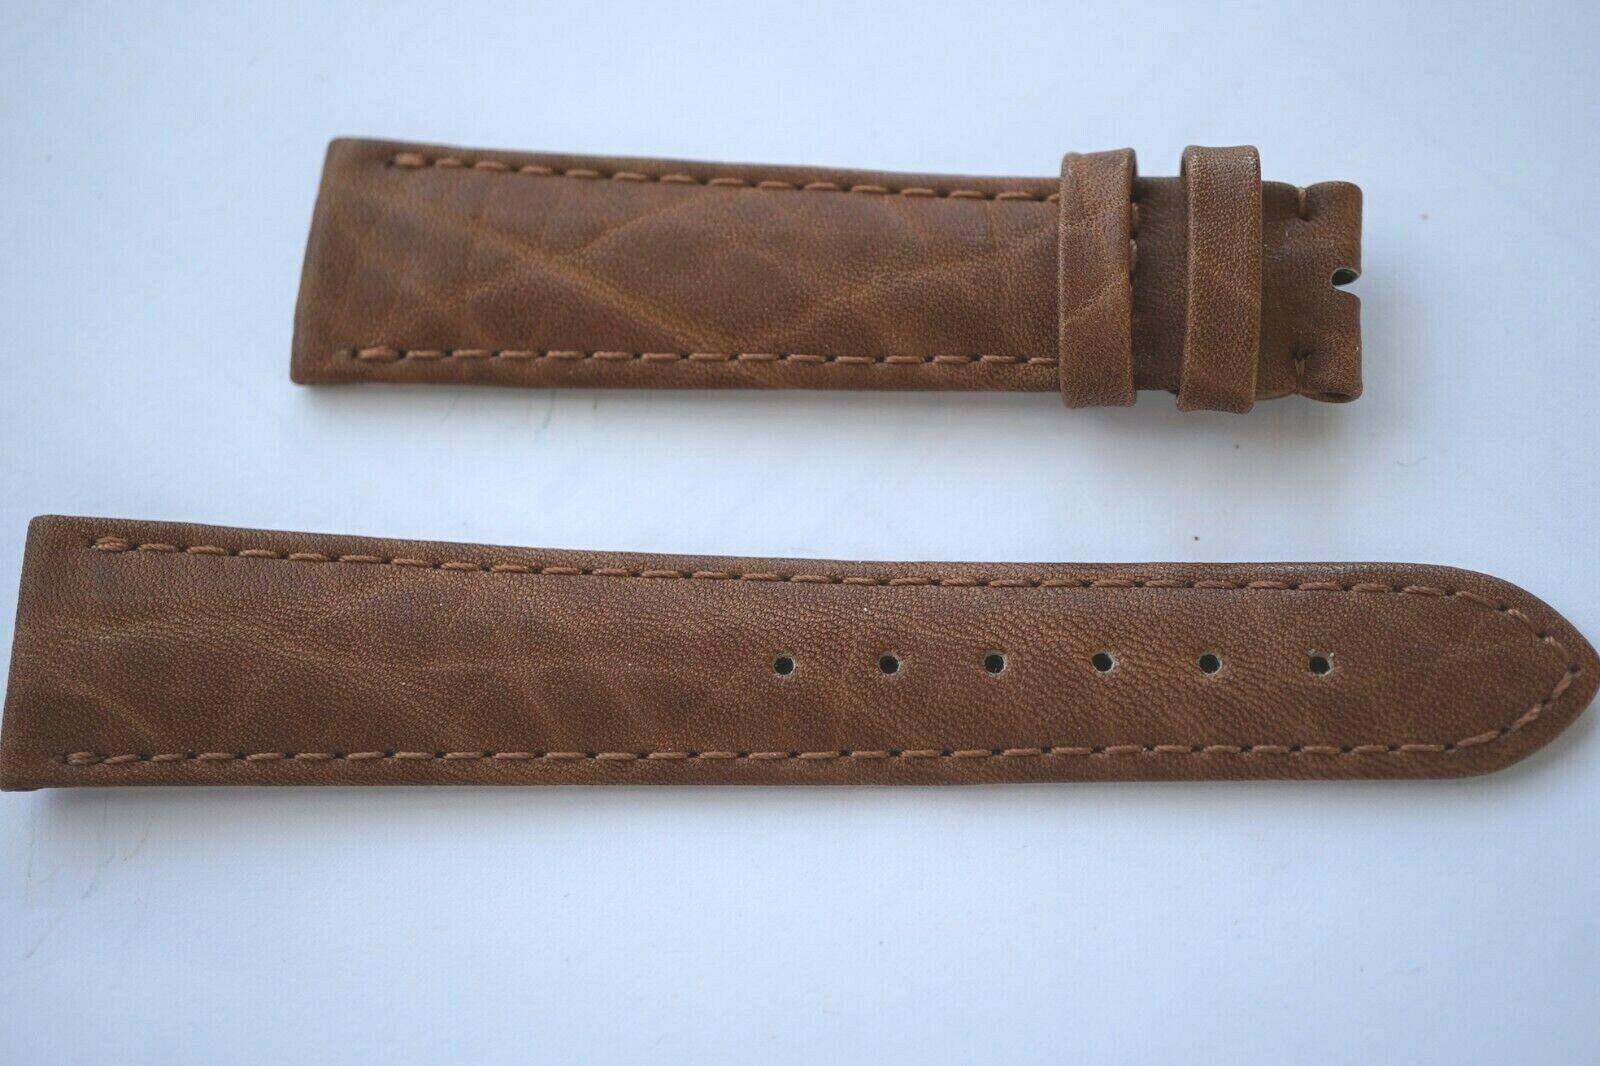 Zenith Uhrenarmband Echt Leder 20 mm Braun